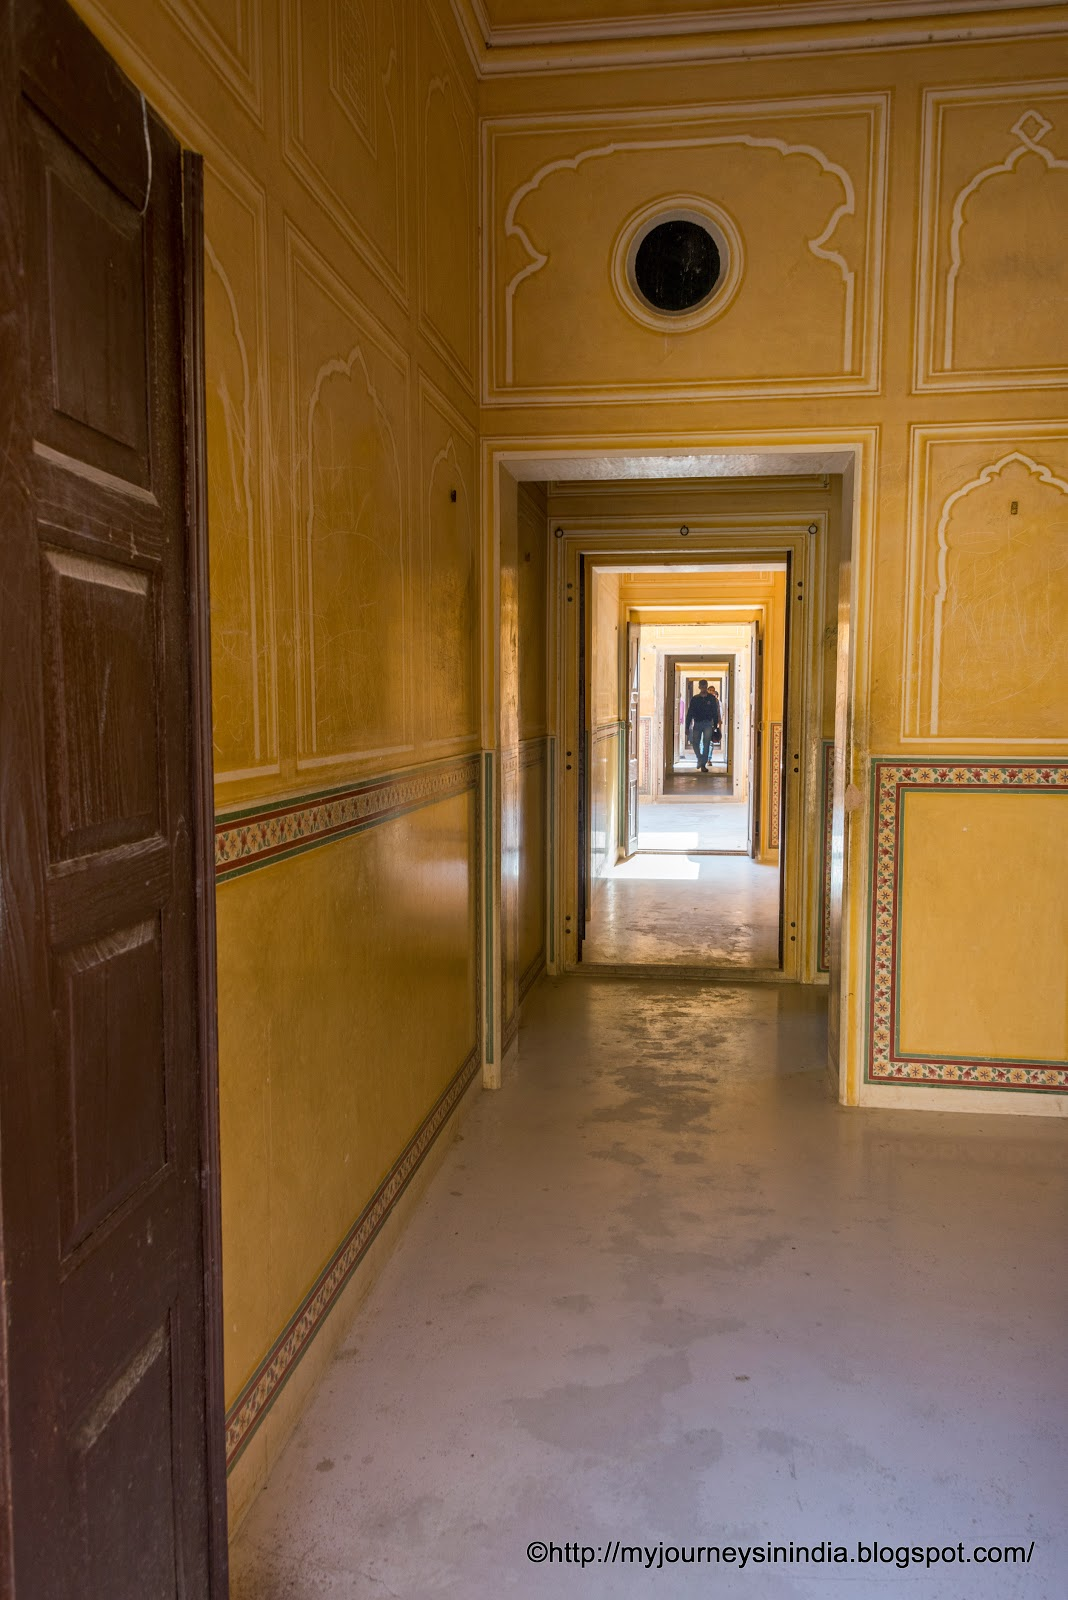 Narrow Chambers Madhavenra Palace Jaipur